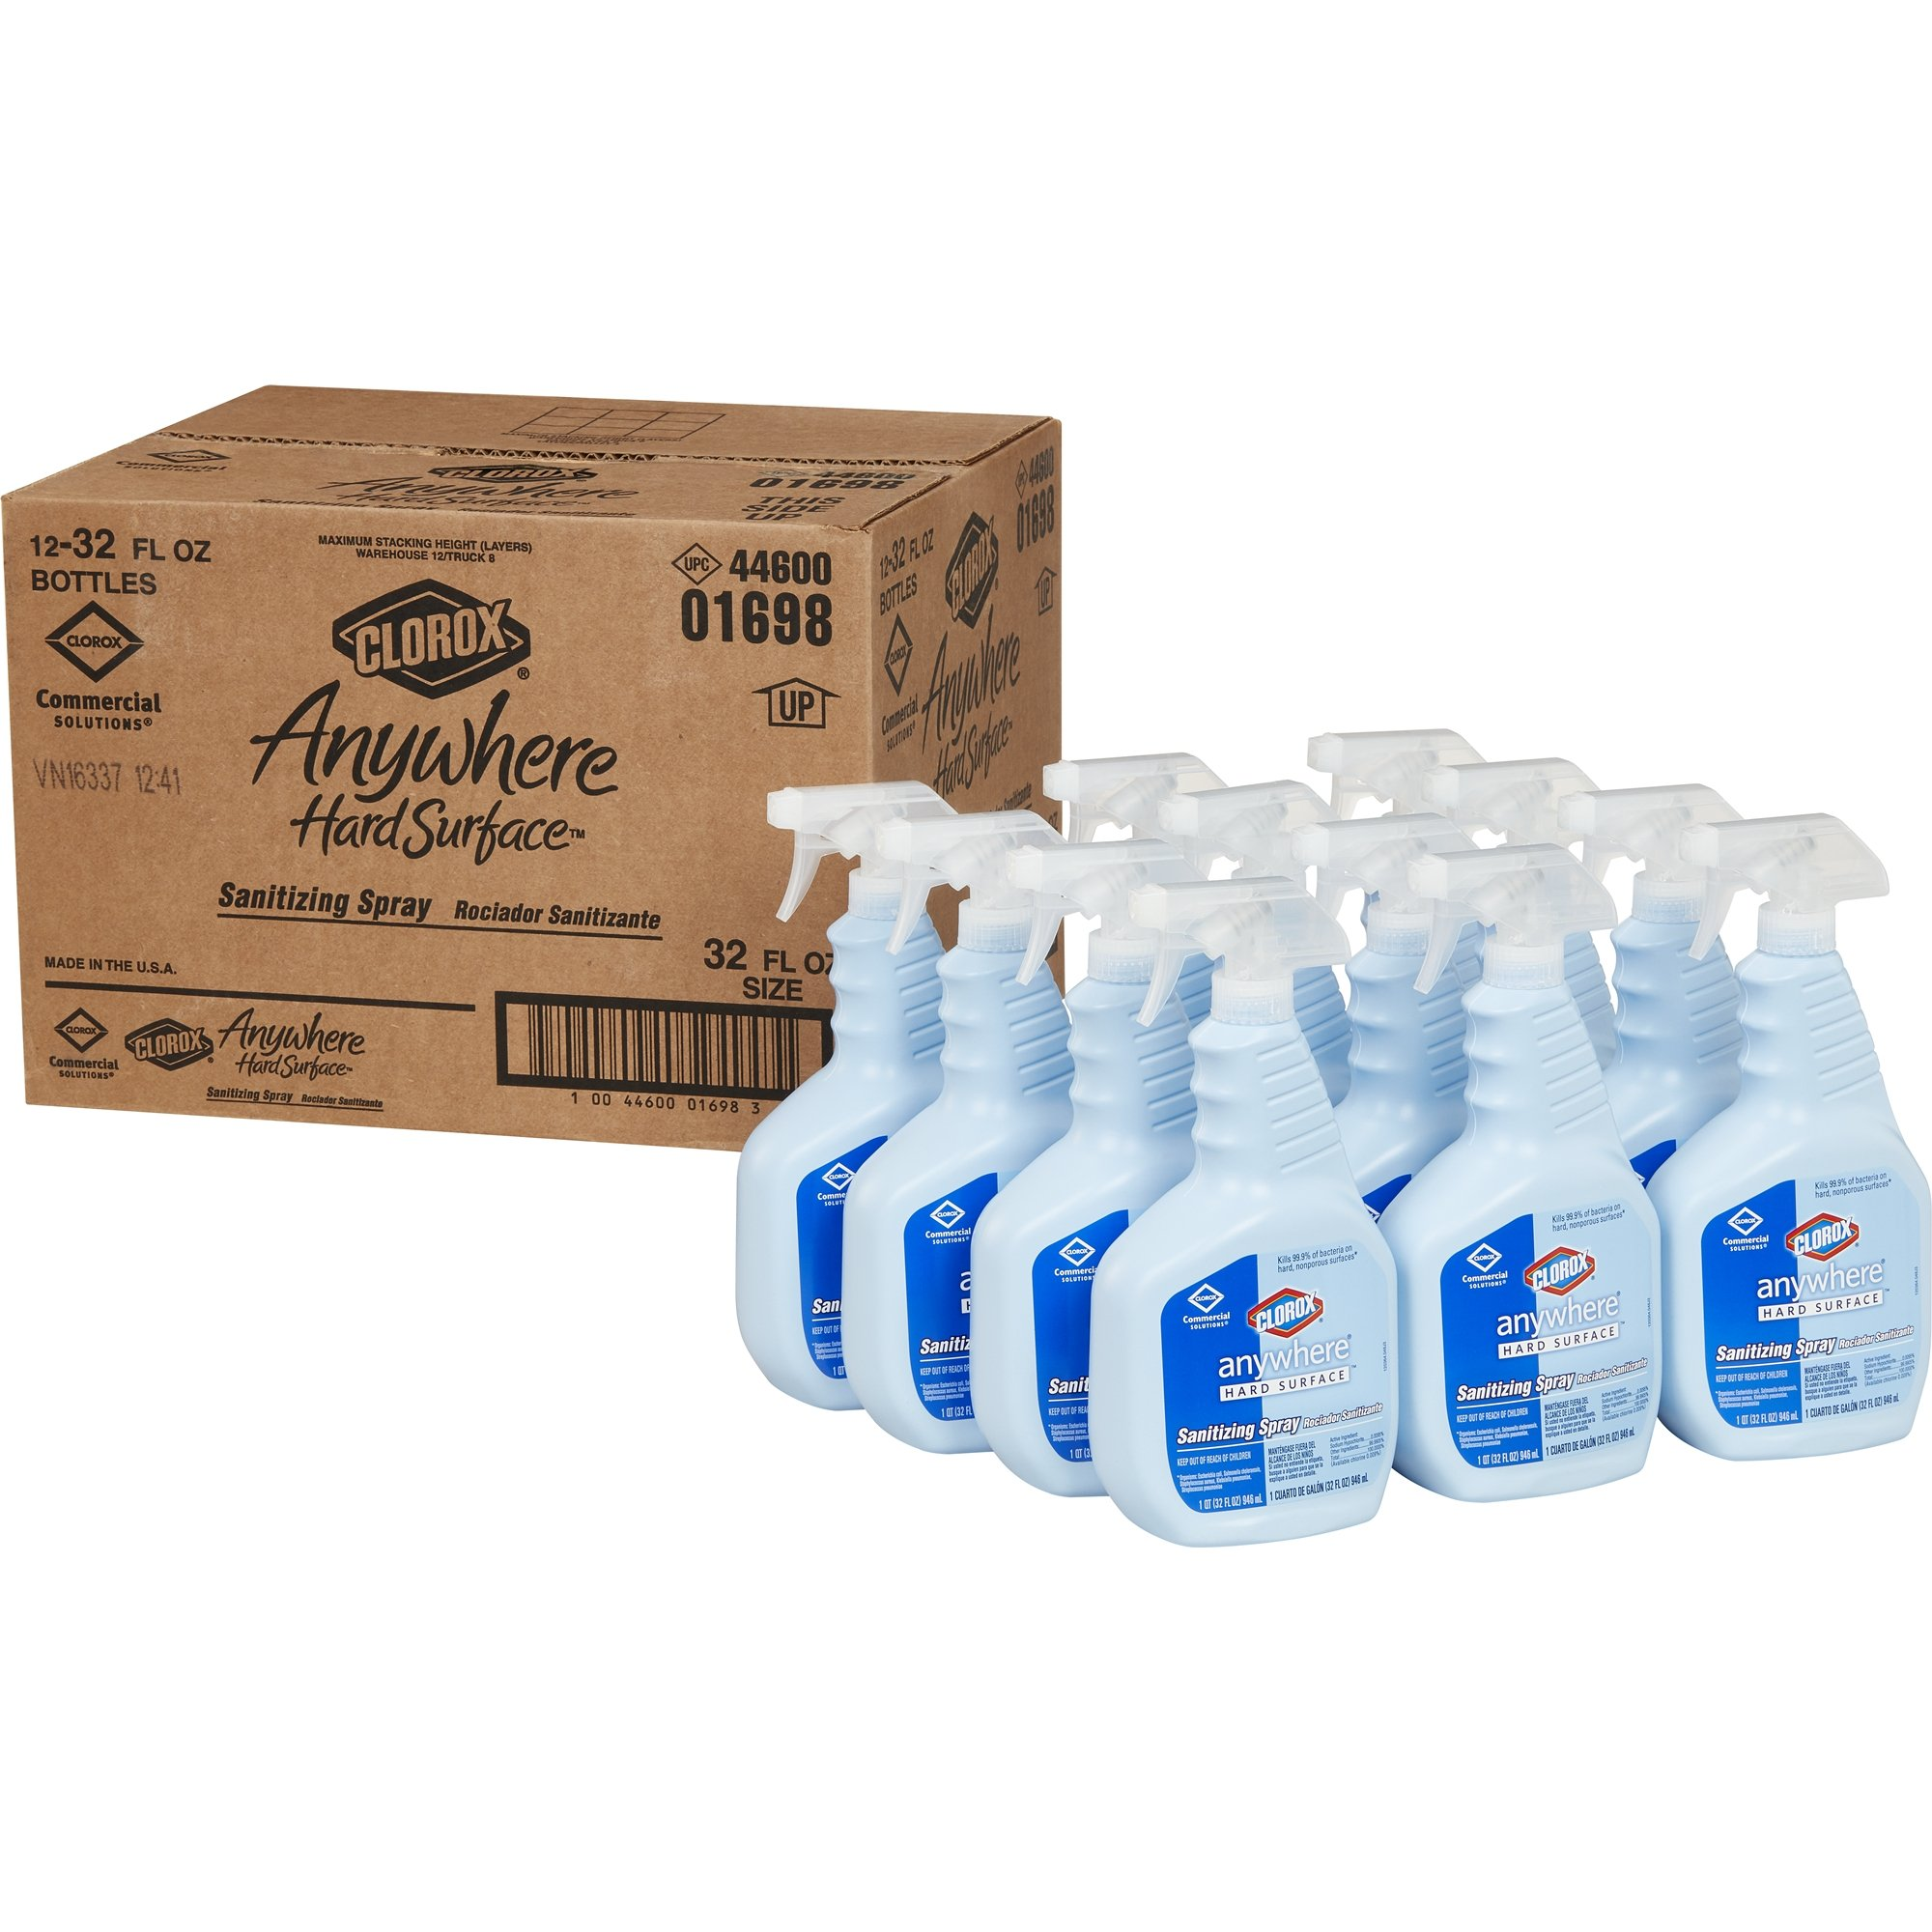 Clorox CLO 01698 32 oz Anywhere Hard Surface Sanitizing Spray Bottle